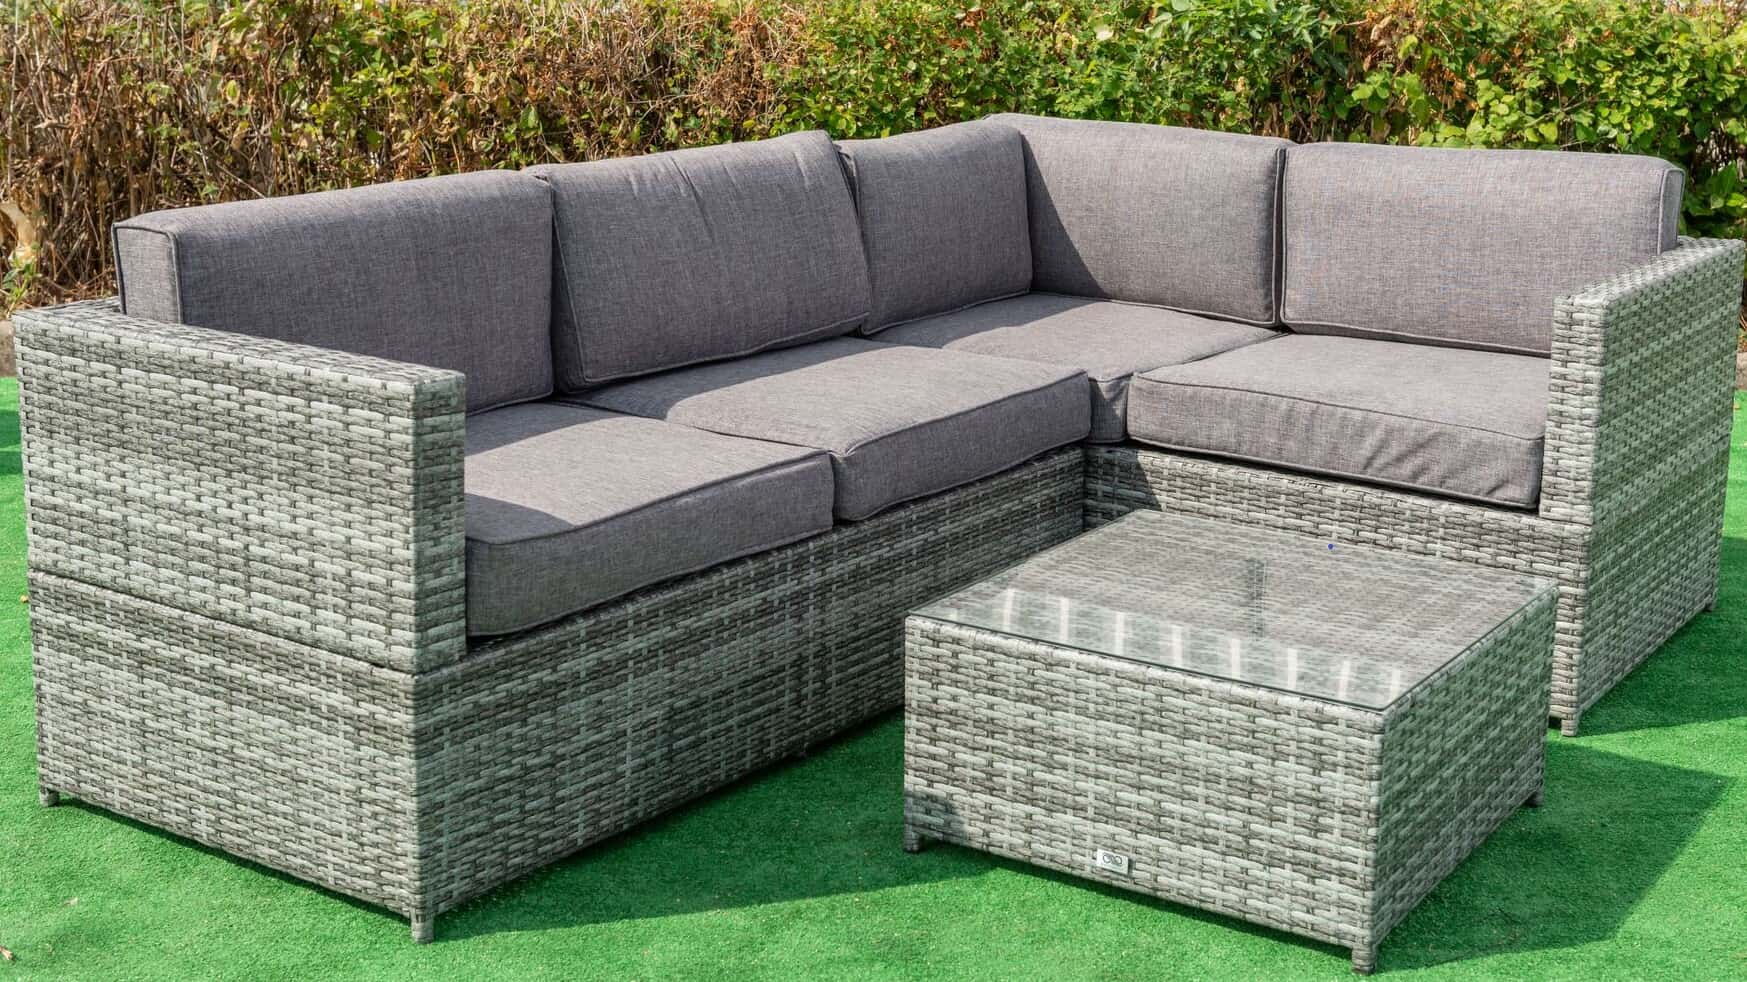 Newquay 3 Piece Corner Sofa Set with Coffee Table